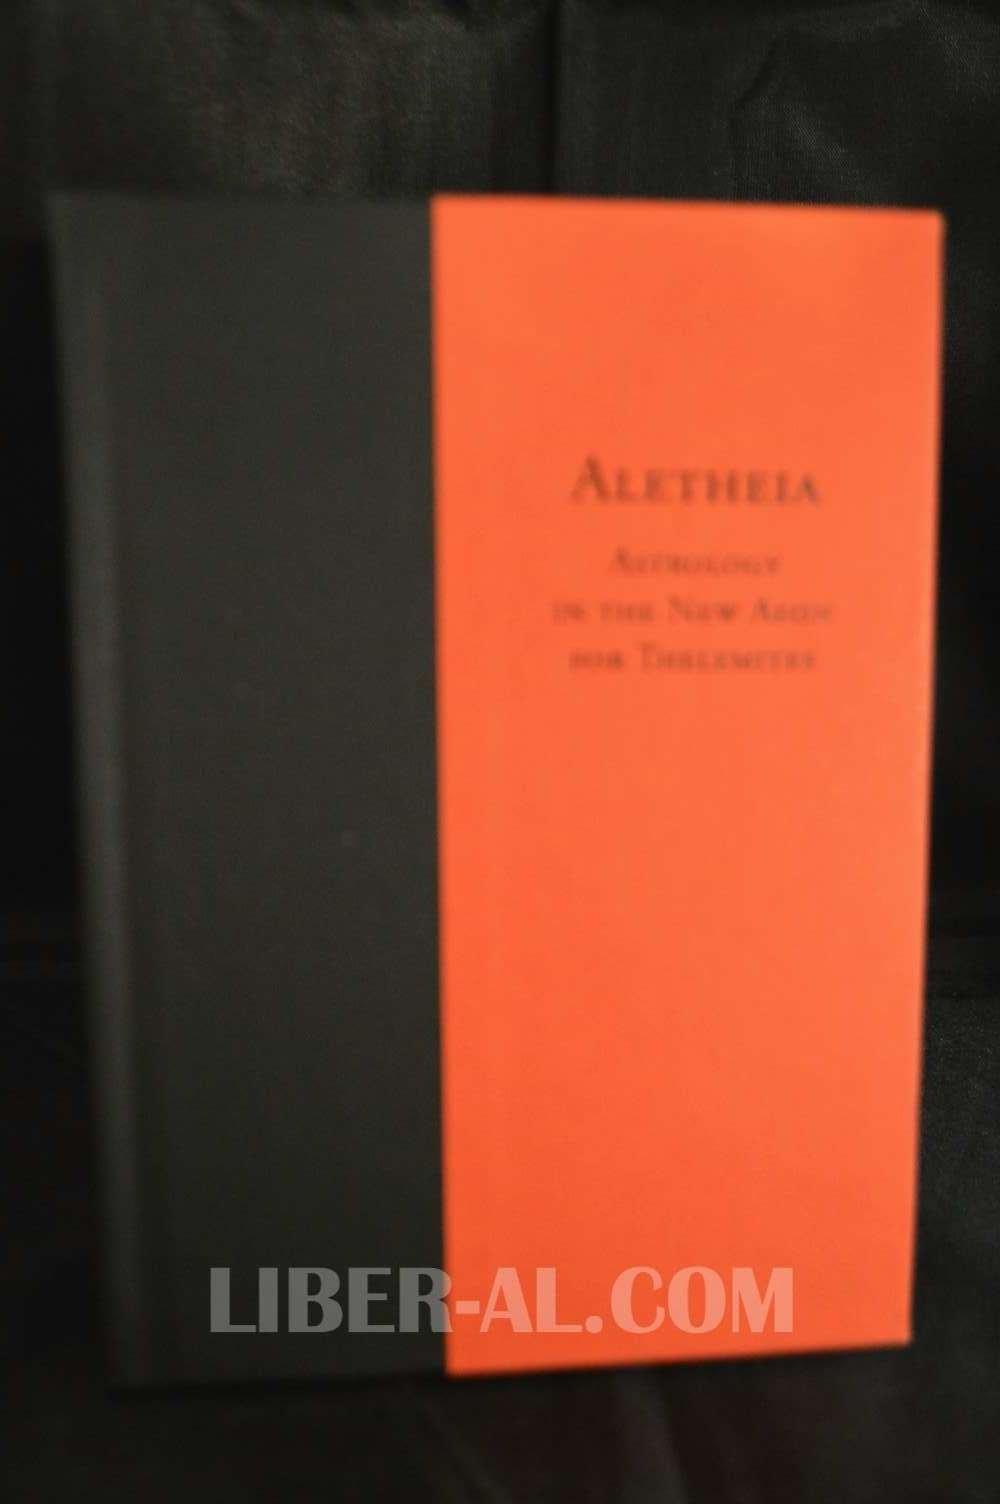 Download Aletheia. Astrology in the New Aeon for Thelemites pdf epub